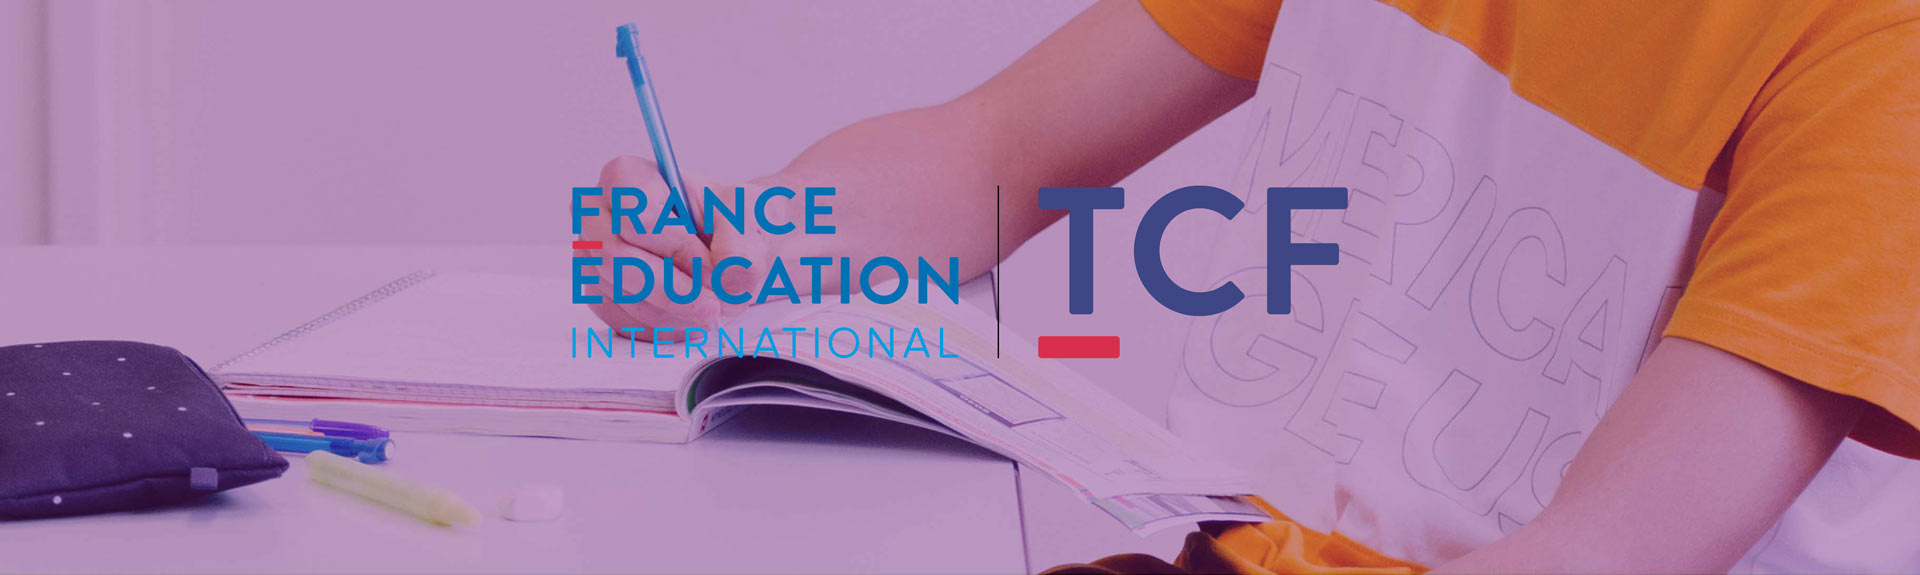 TCF - France Education International